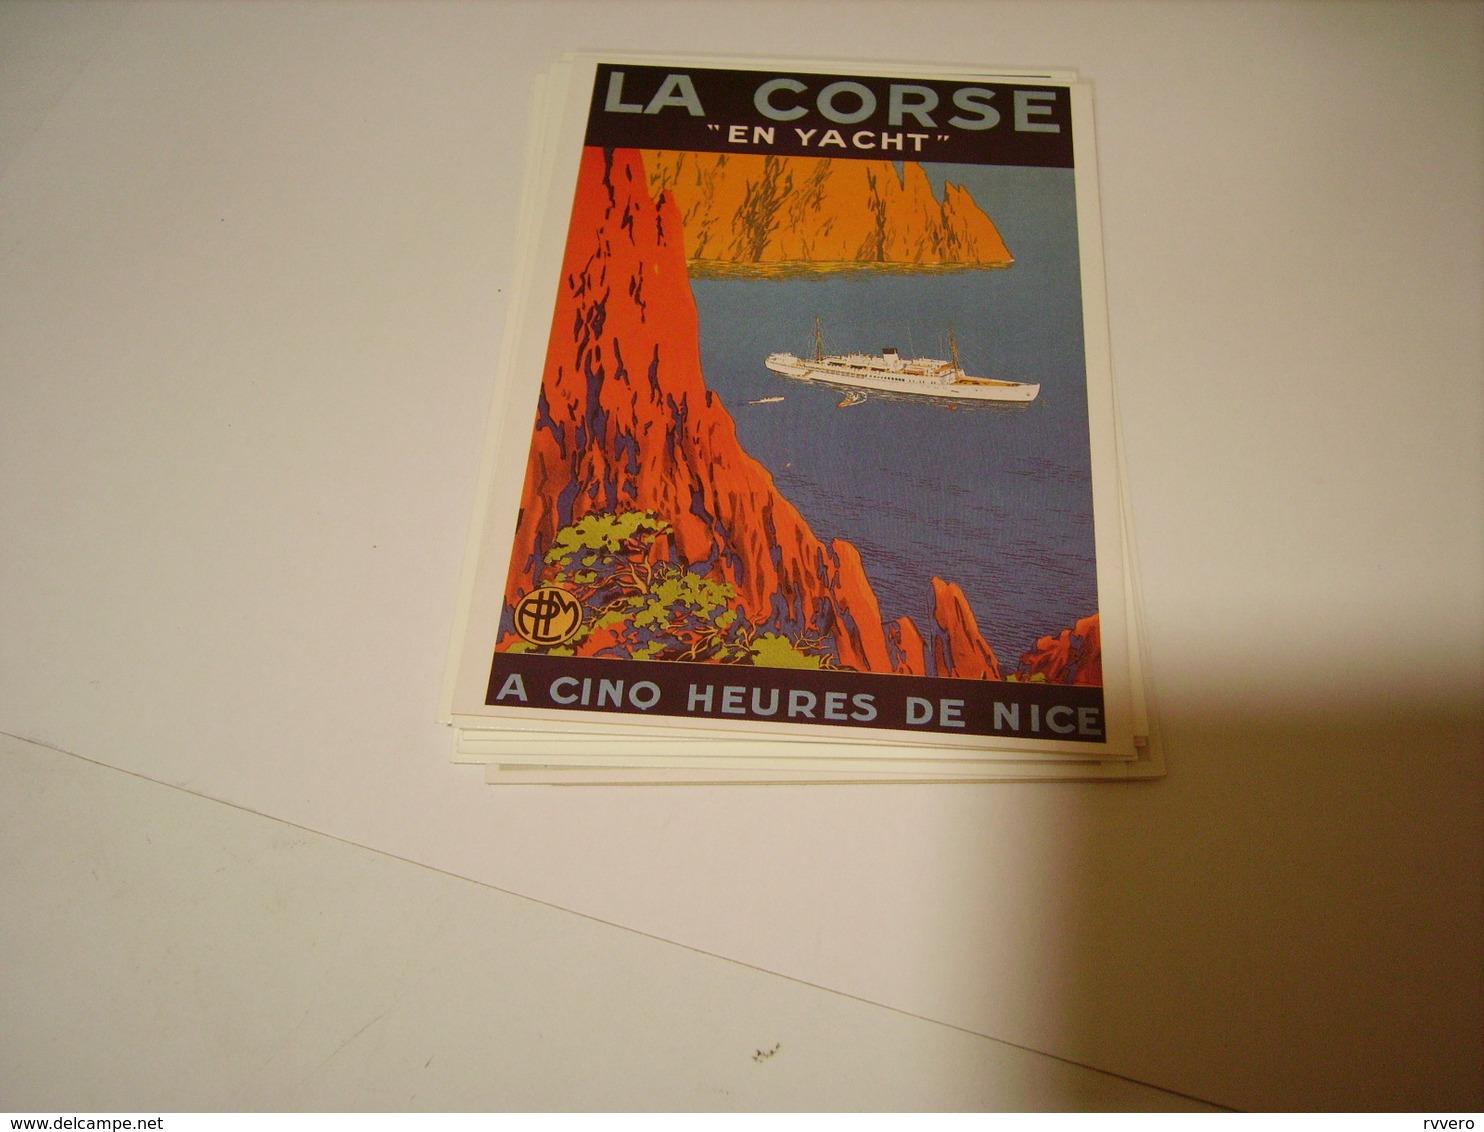 PUBLICITE LA CORSE EN YACHT - Francia